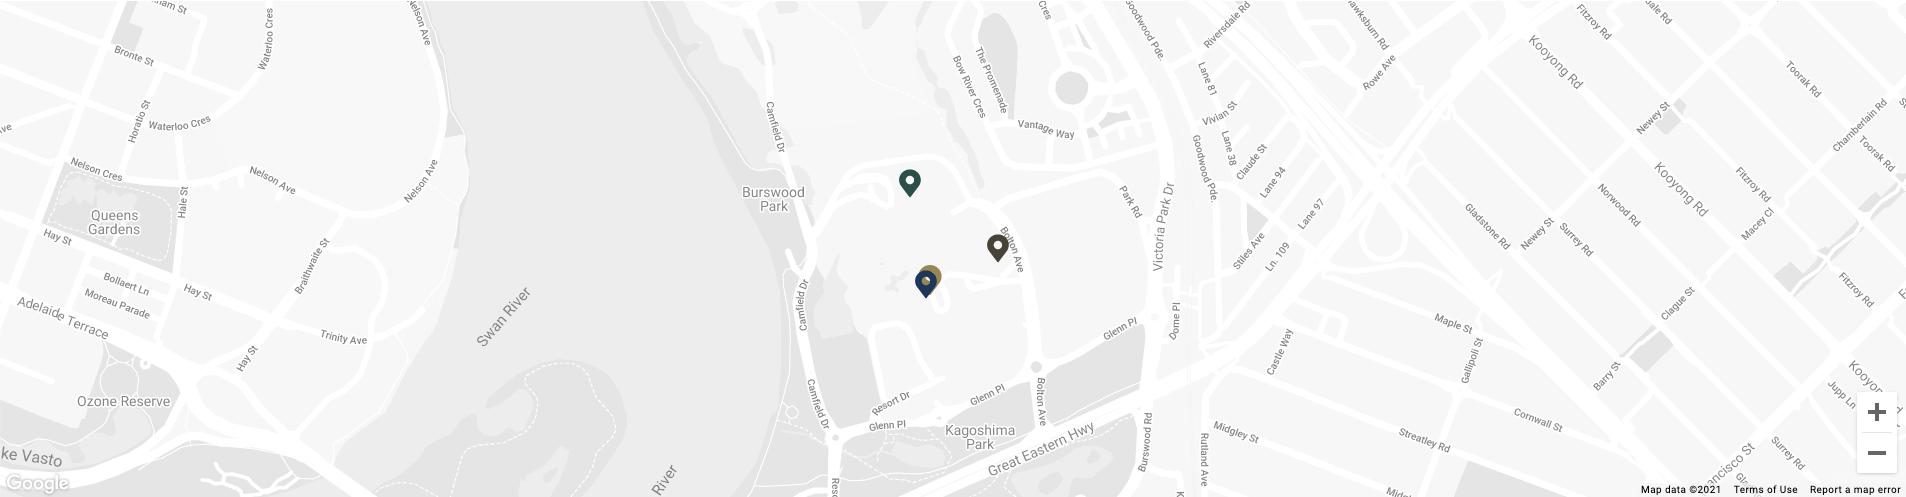 Map image of Lobby Lounge